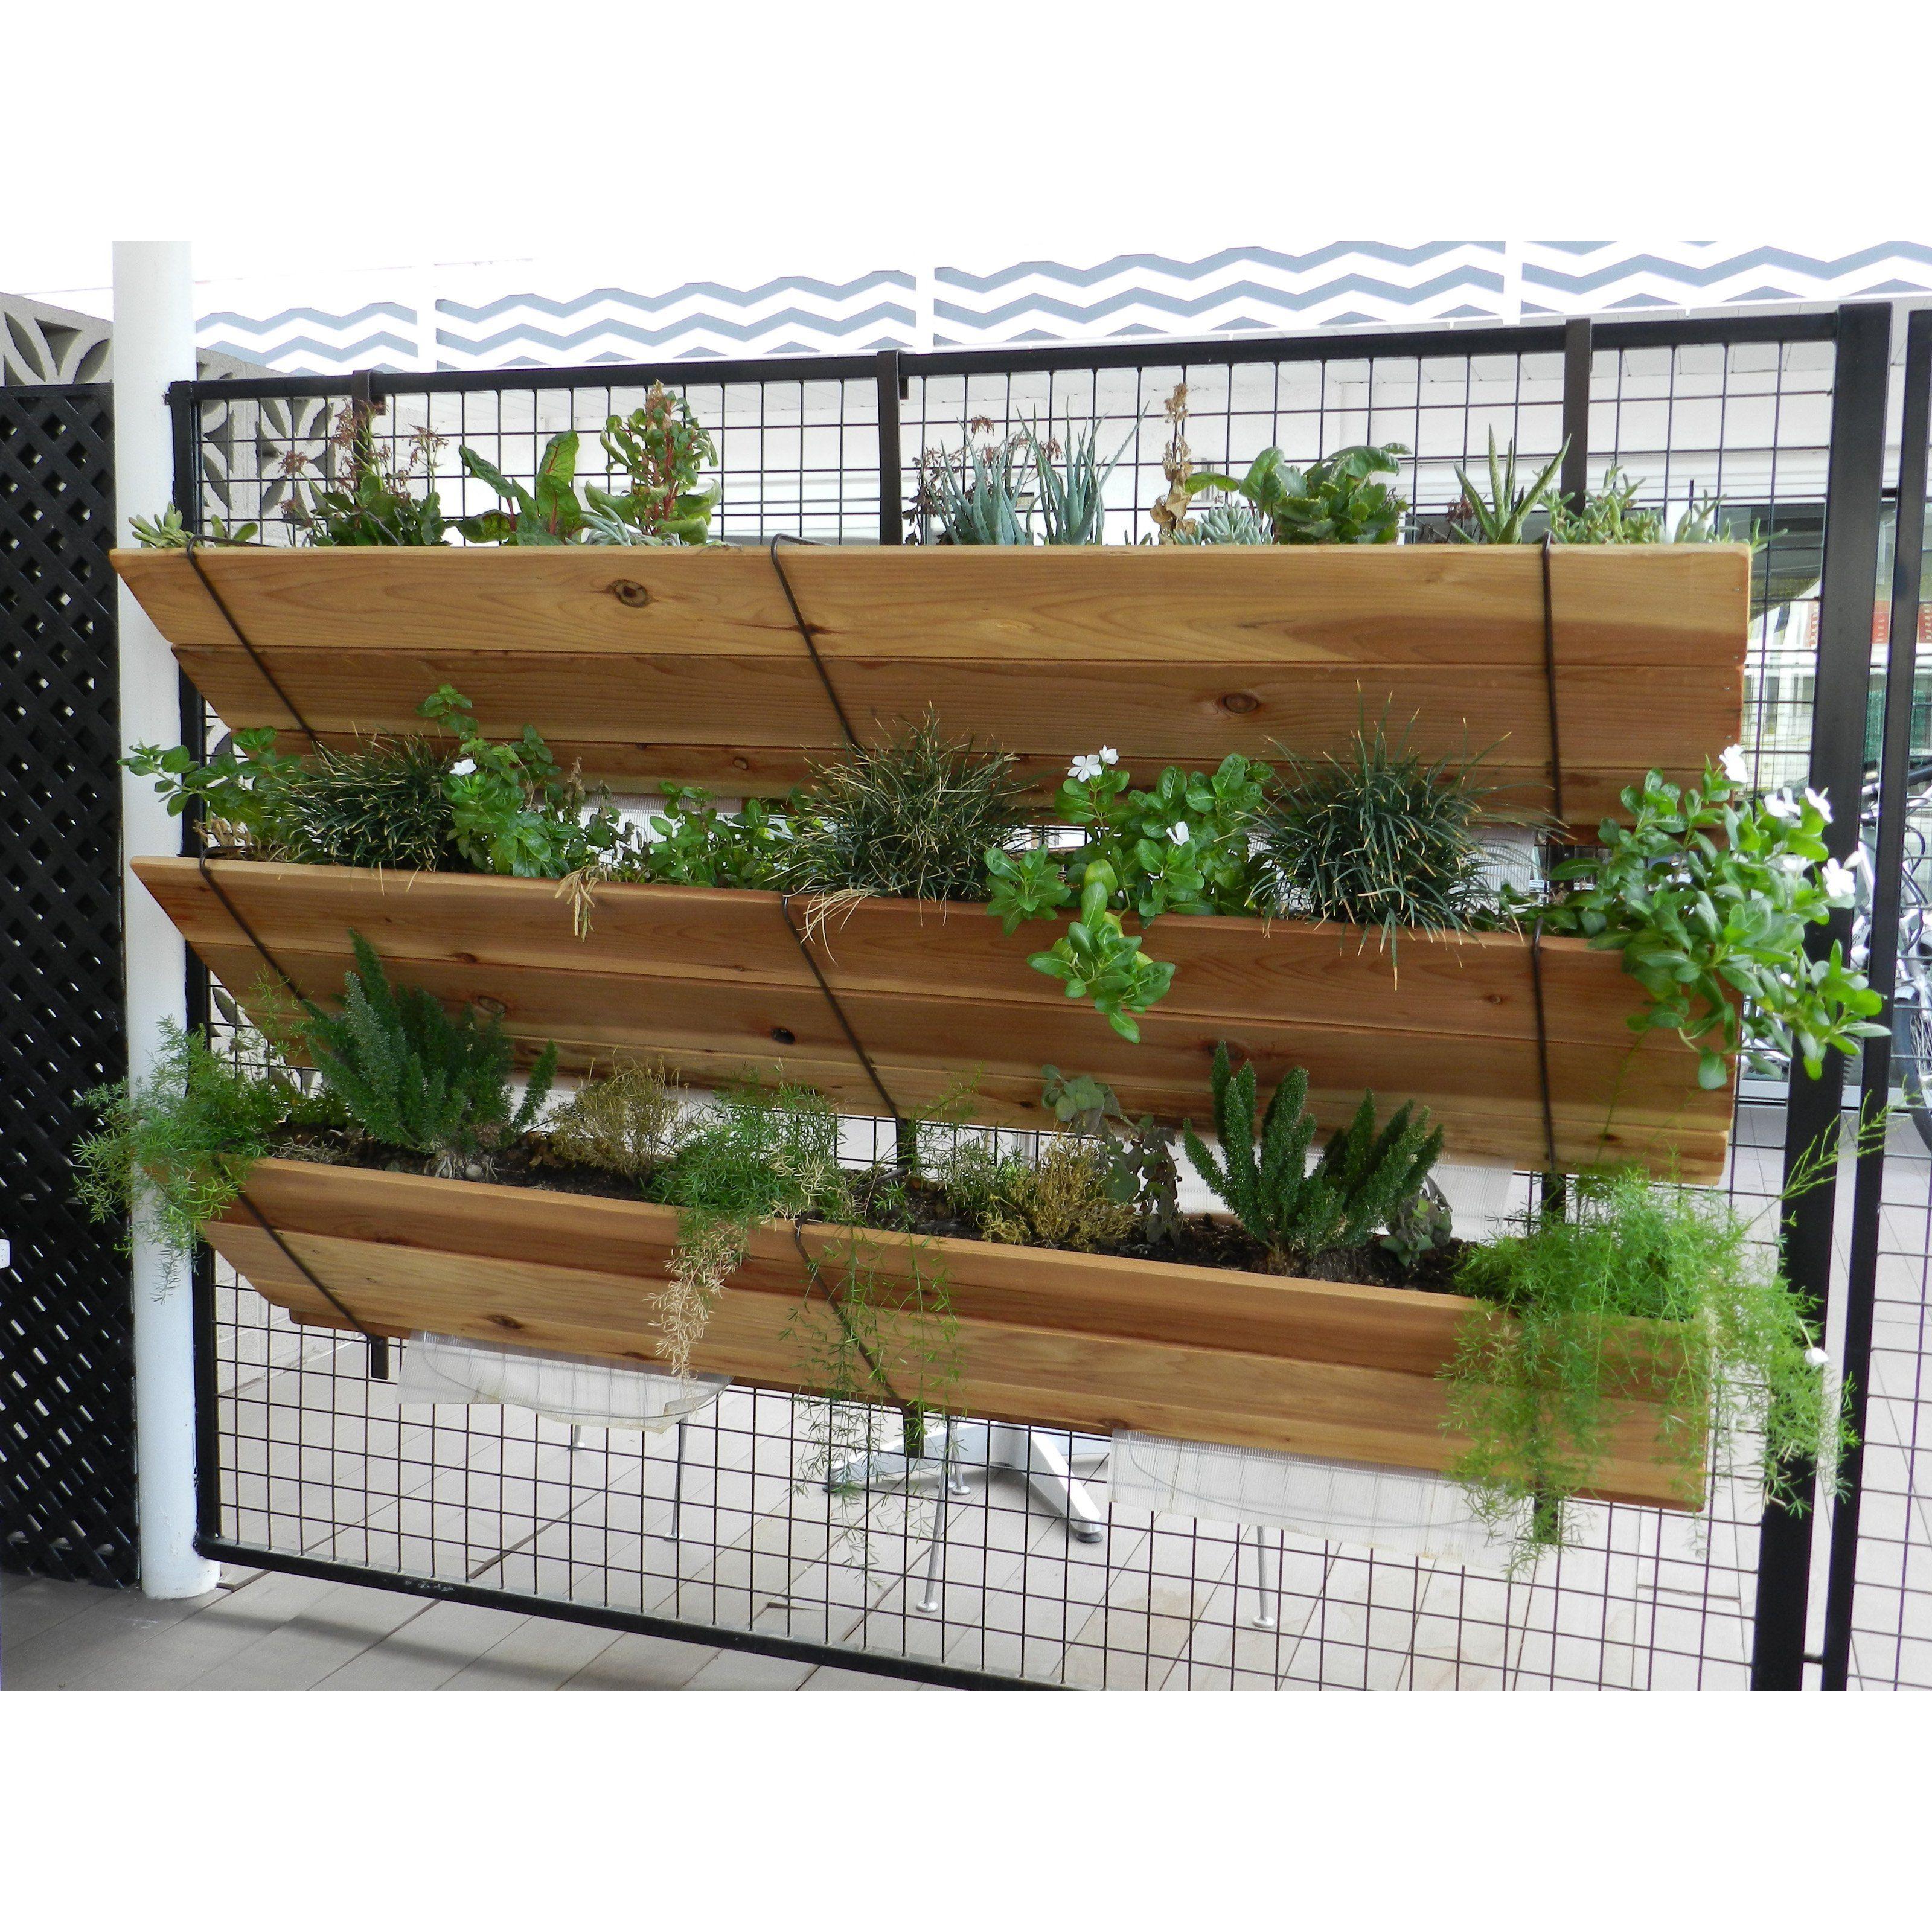 Vertical Garden - From Hayneedlecom